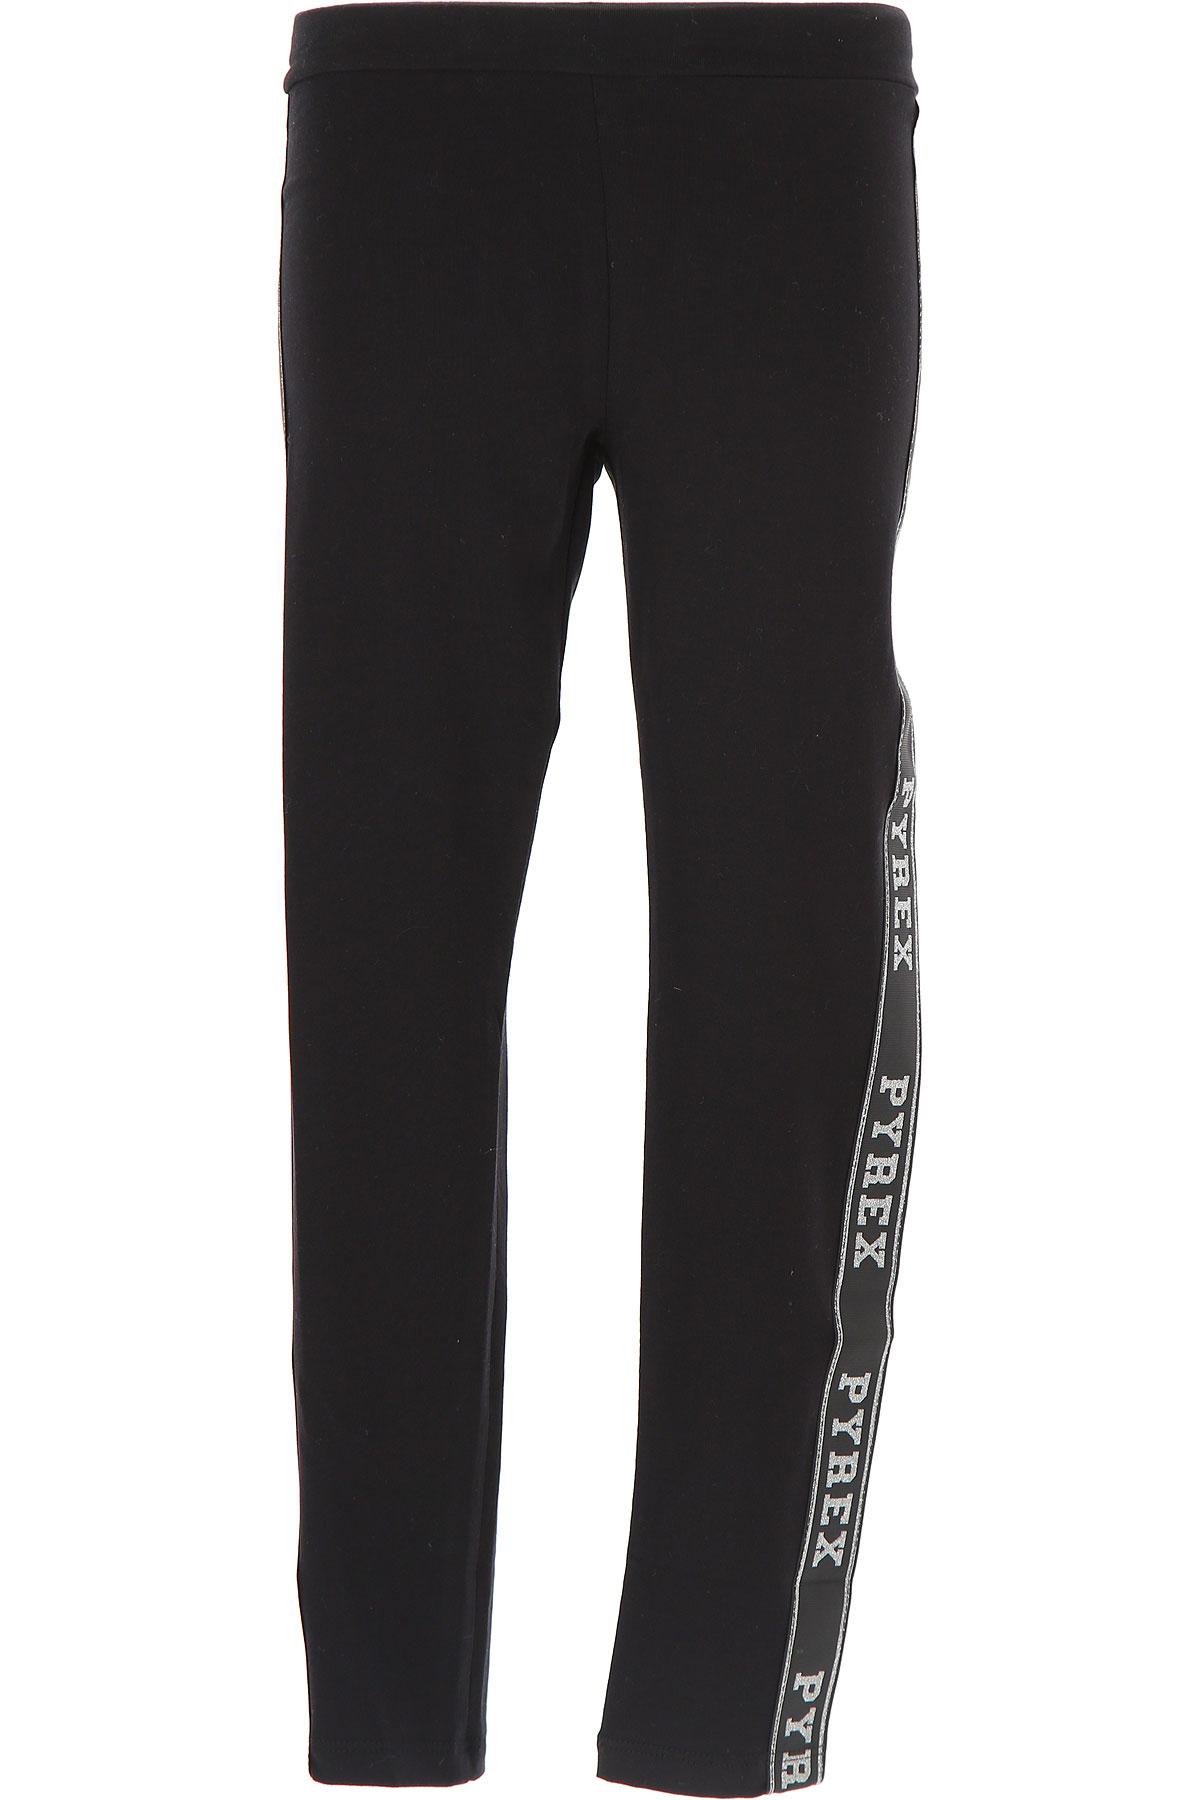 Image of Pyrex Kids Pants for Girls, Black, Cotton, 2017, XL (14 Y) XXL (16 Y) XS